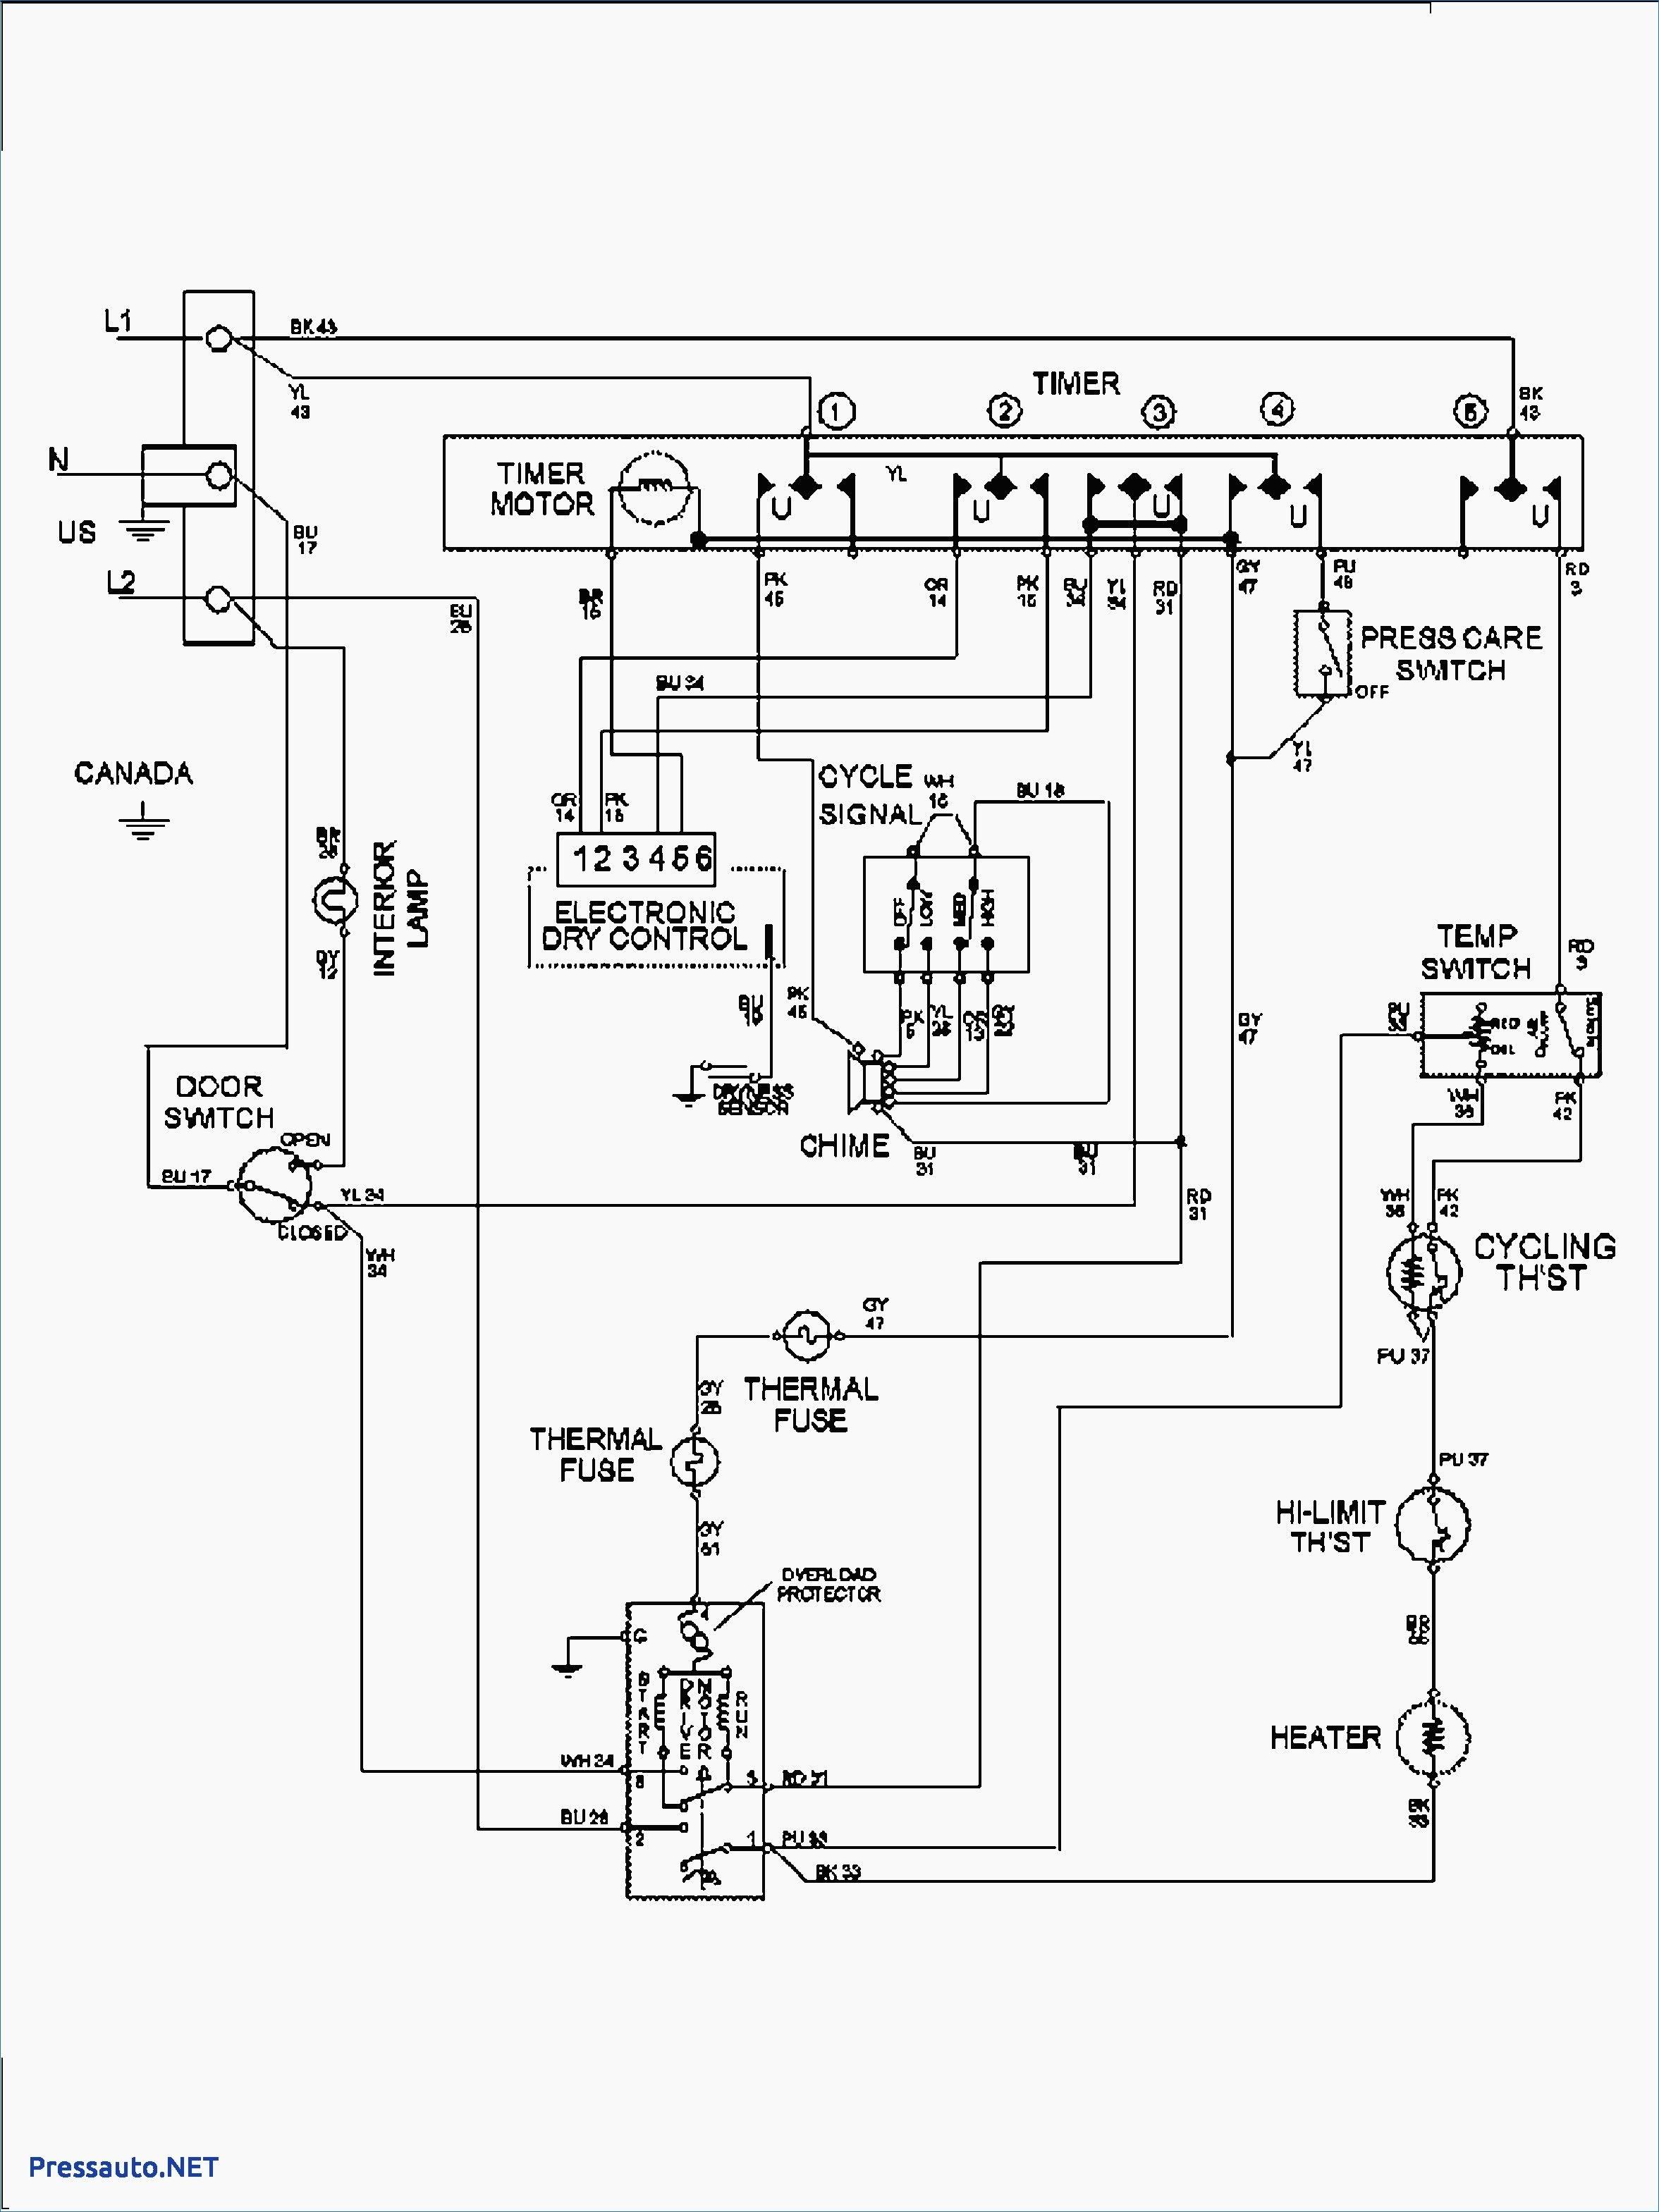 wiring diagram of washing machine with dryer wiring diagram wiring diagram of washing machine with dryer [ 2353 x 3138 Pixel ]